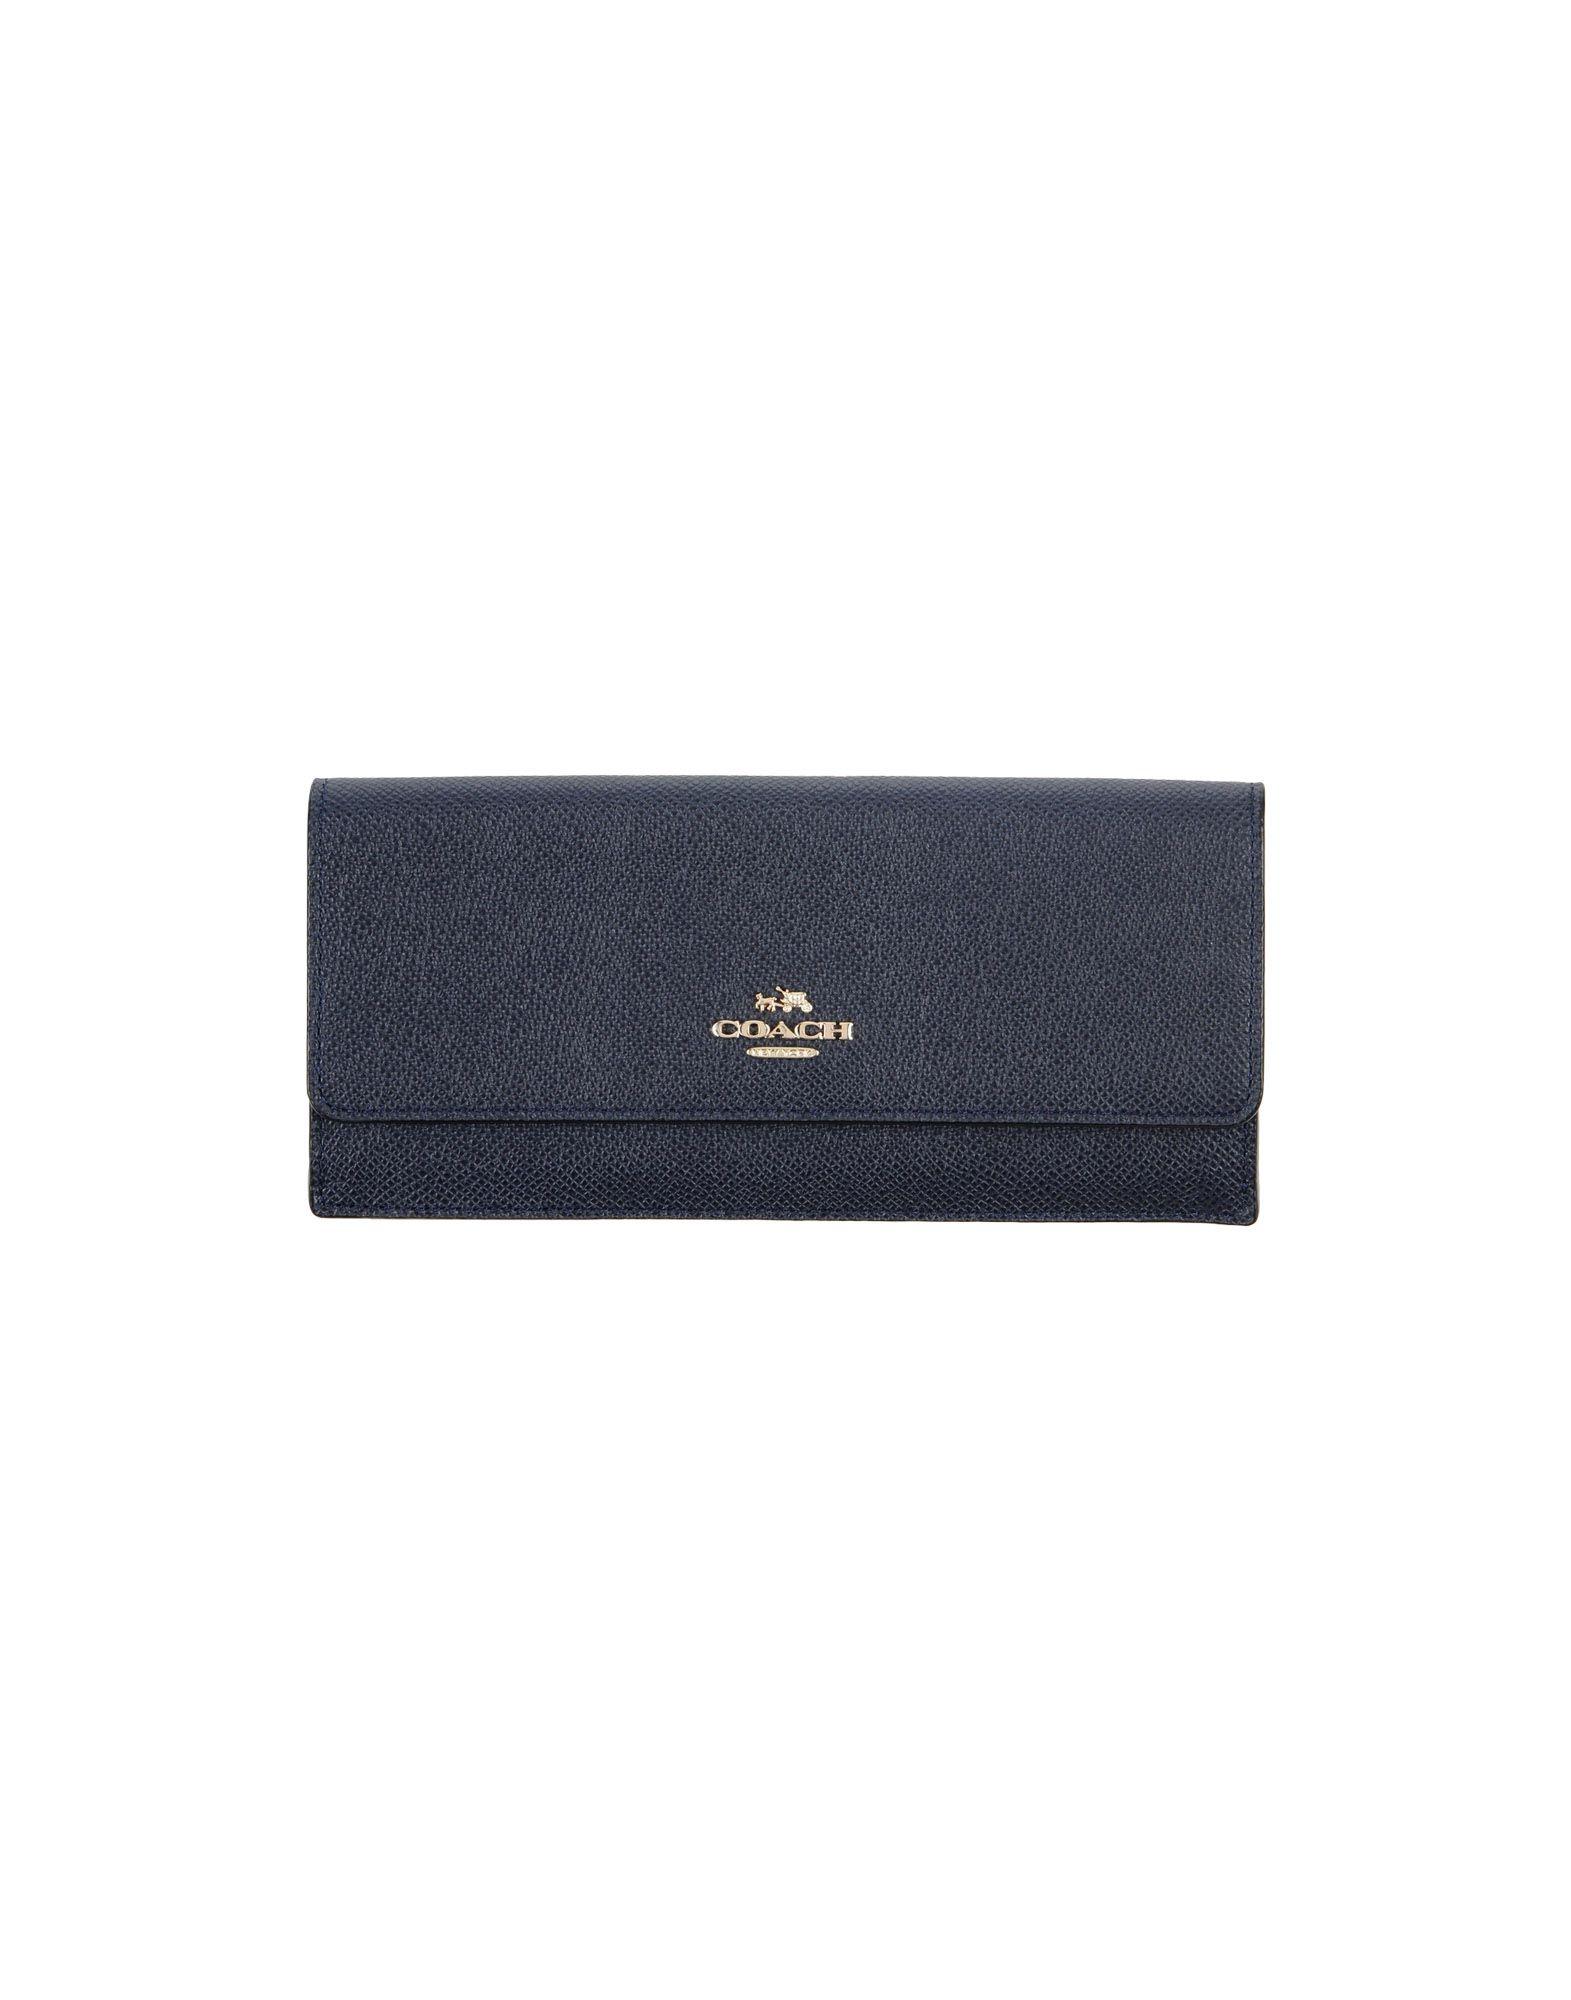 COACH Wallets - Item 46507097